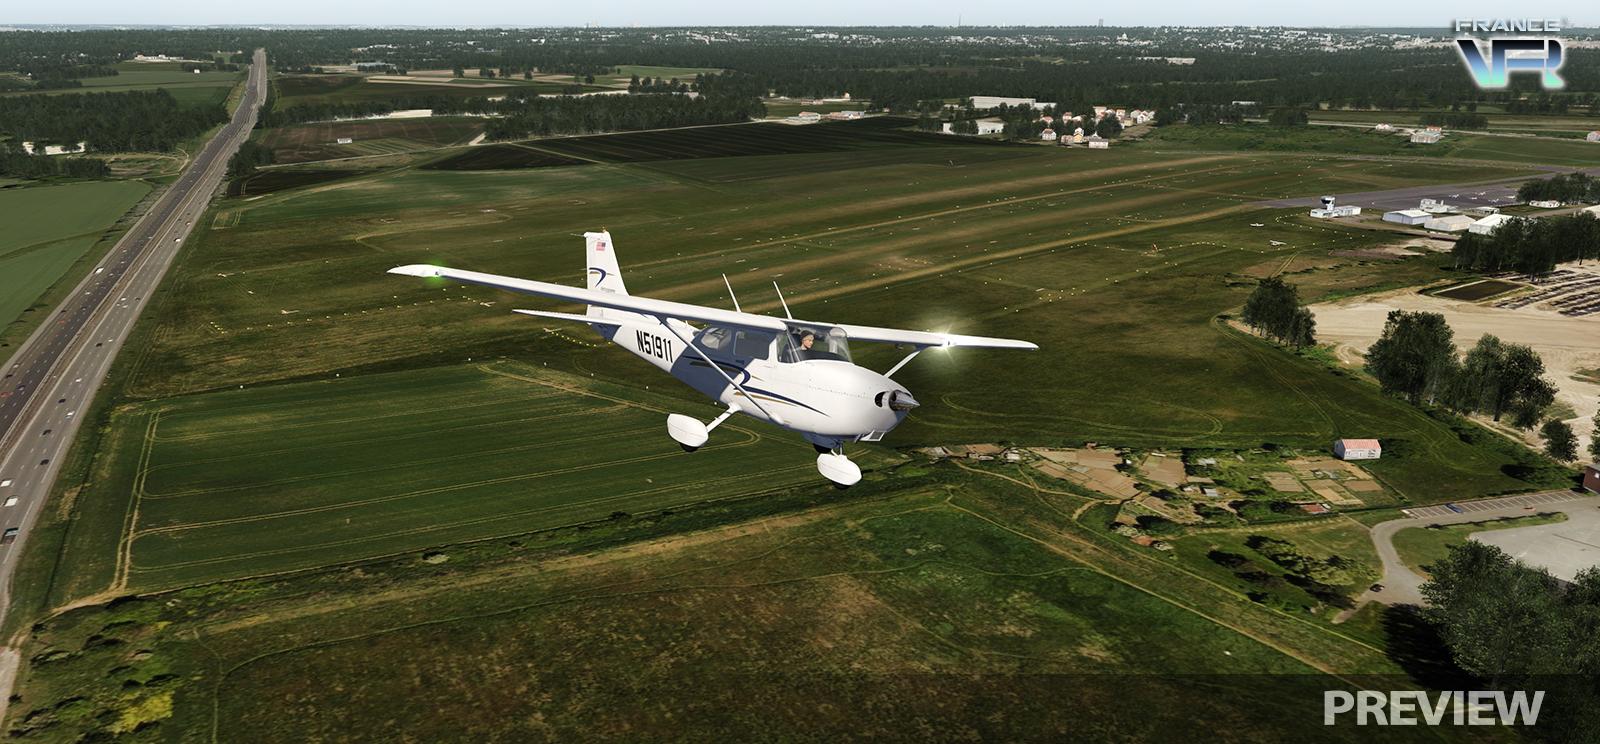 aerofly_fs_2_screenshot_29_20200126-0240